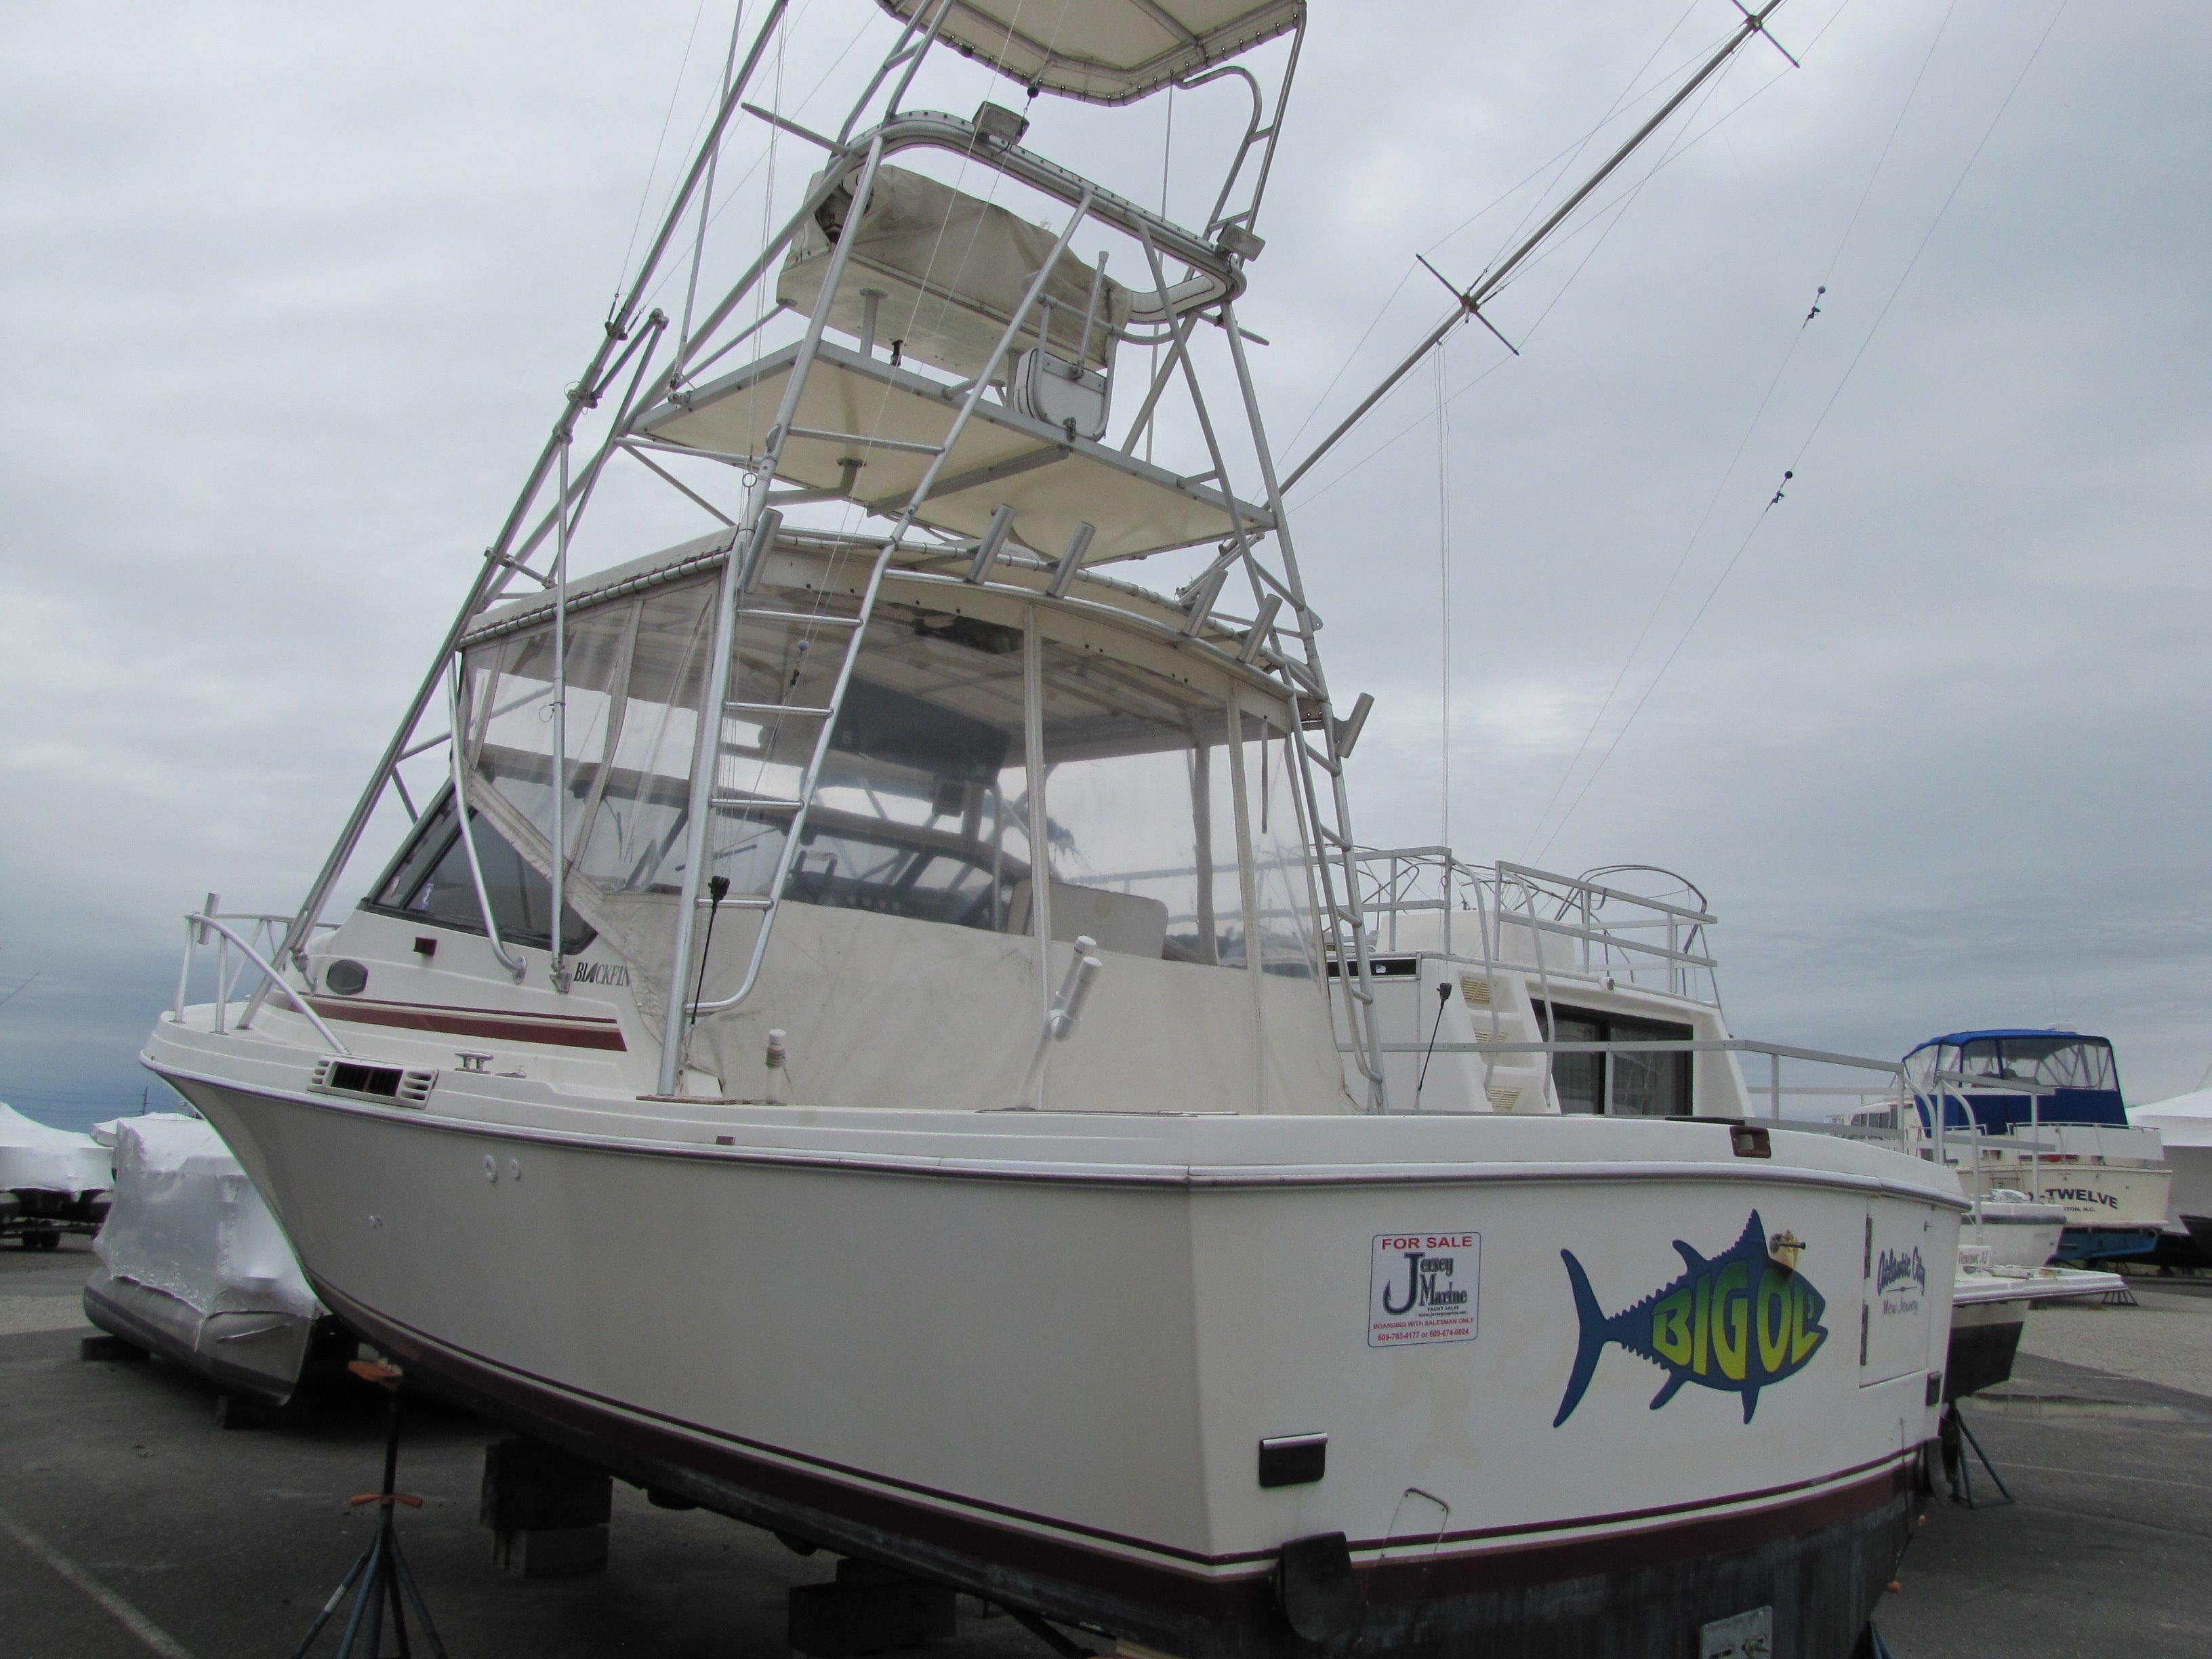 Deep Impact Boats >> 1989 Blackfin 32 Combi Power Boat For Sale - www.yachtworld.com